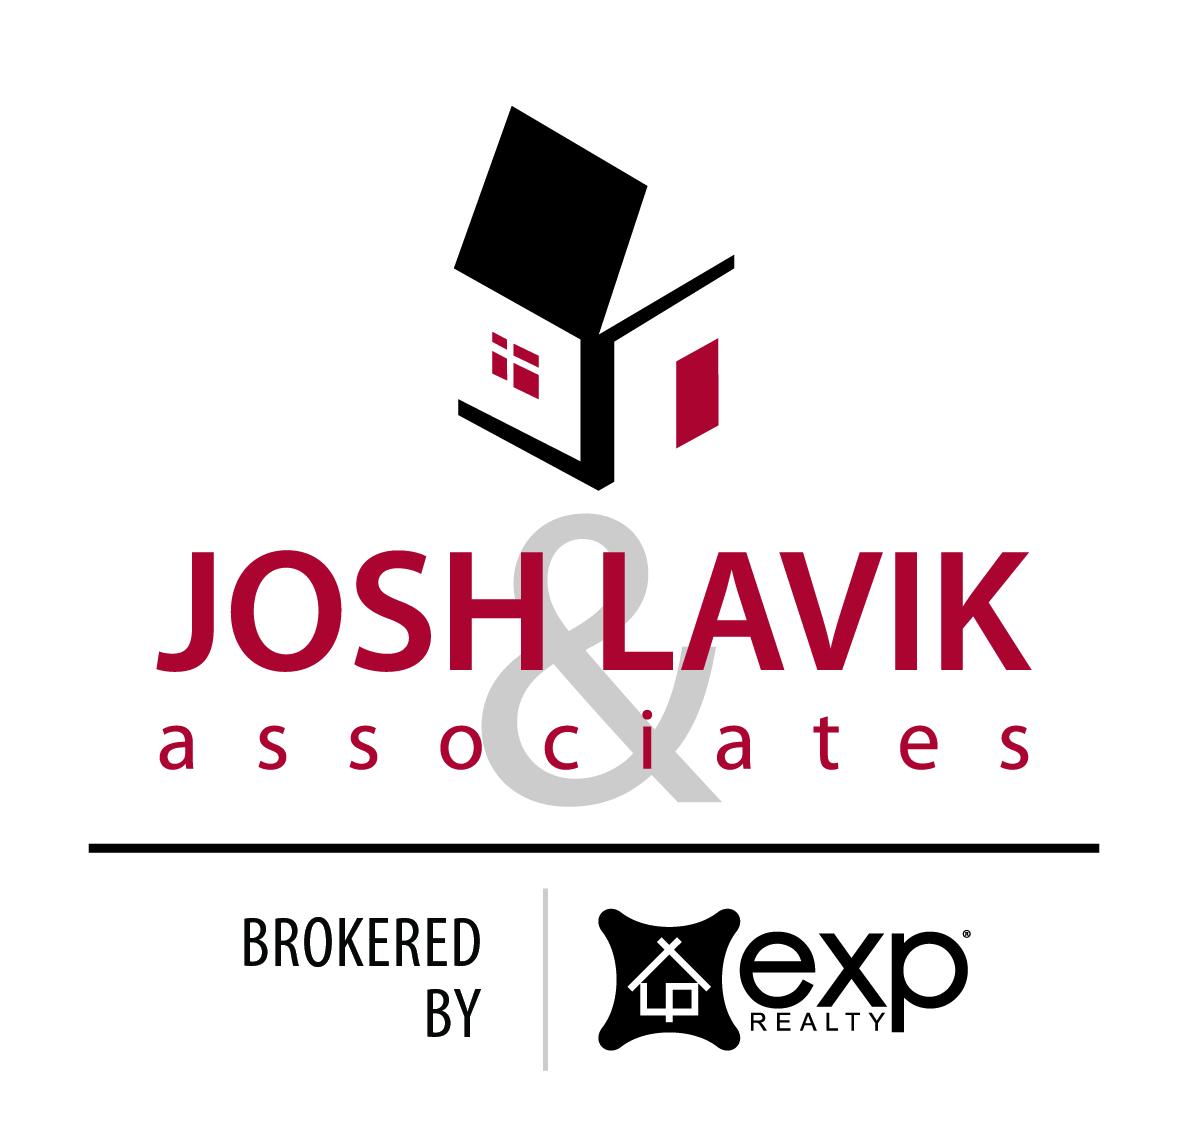 Josh Lavik & Associates logo